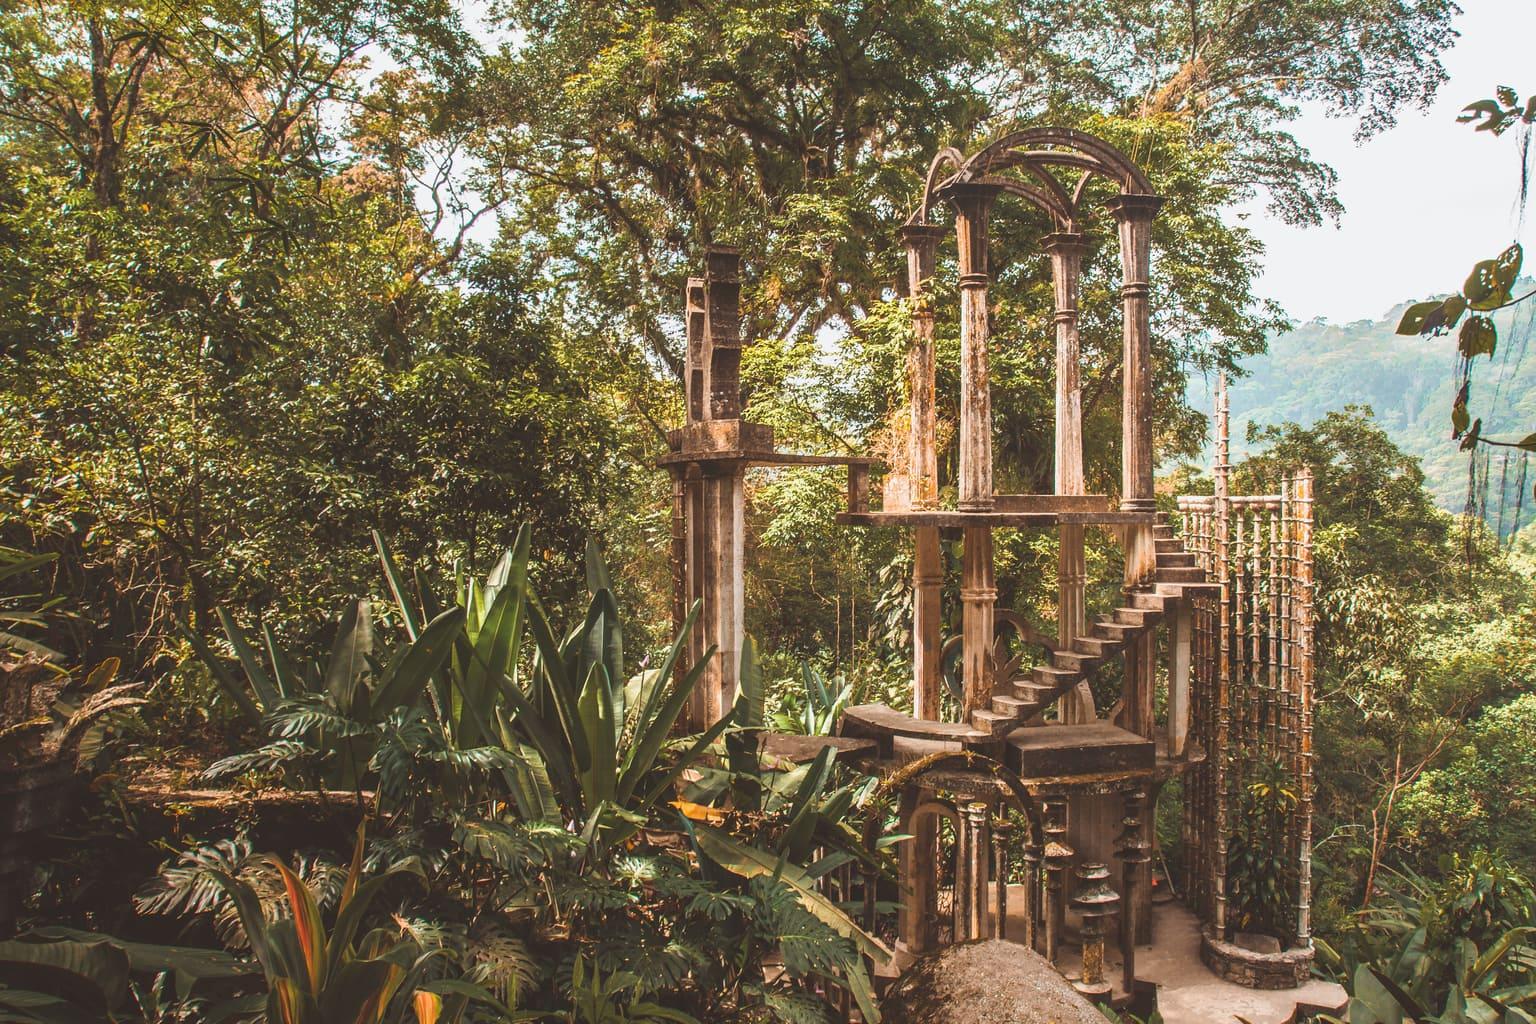 Bamboo Palace, las pozas edward james, las pozas edward james, las pozas, visiting las pozas, surrealist garden, surrealist jungle, huasteca potosina, xilitla, xilitla san luis potosí, surreal garden mexico